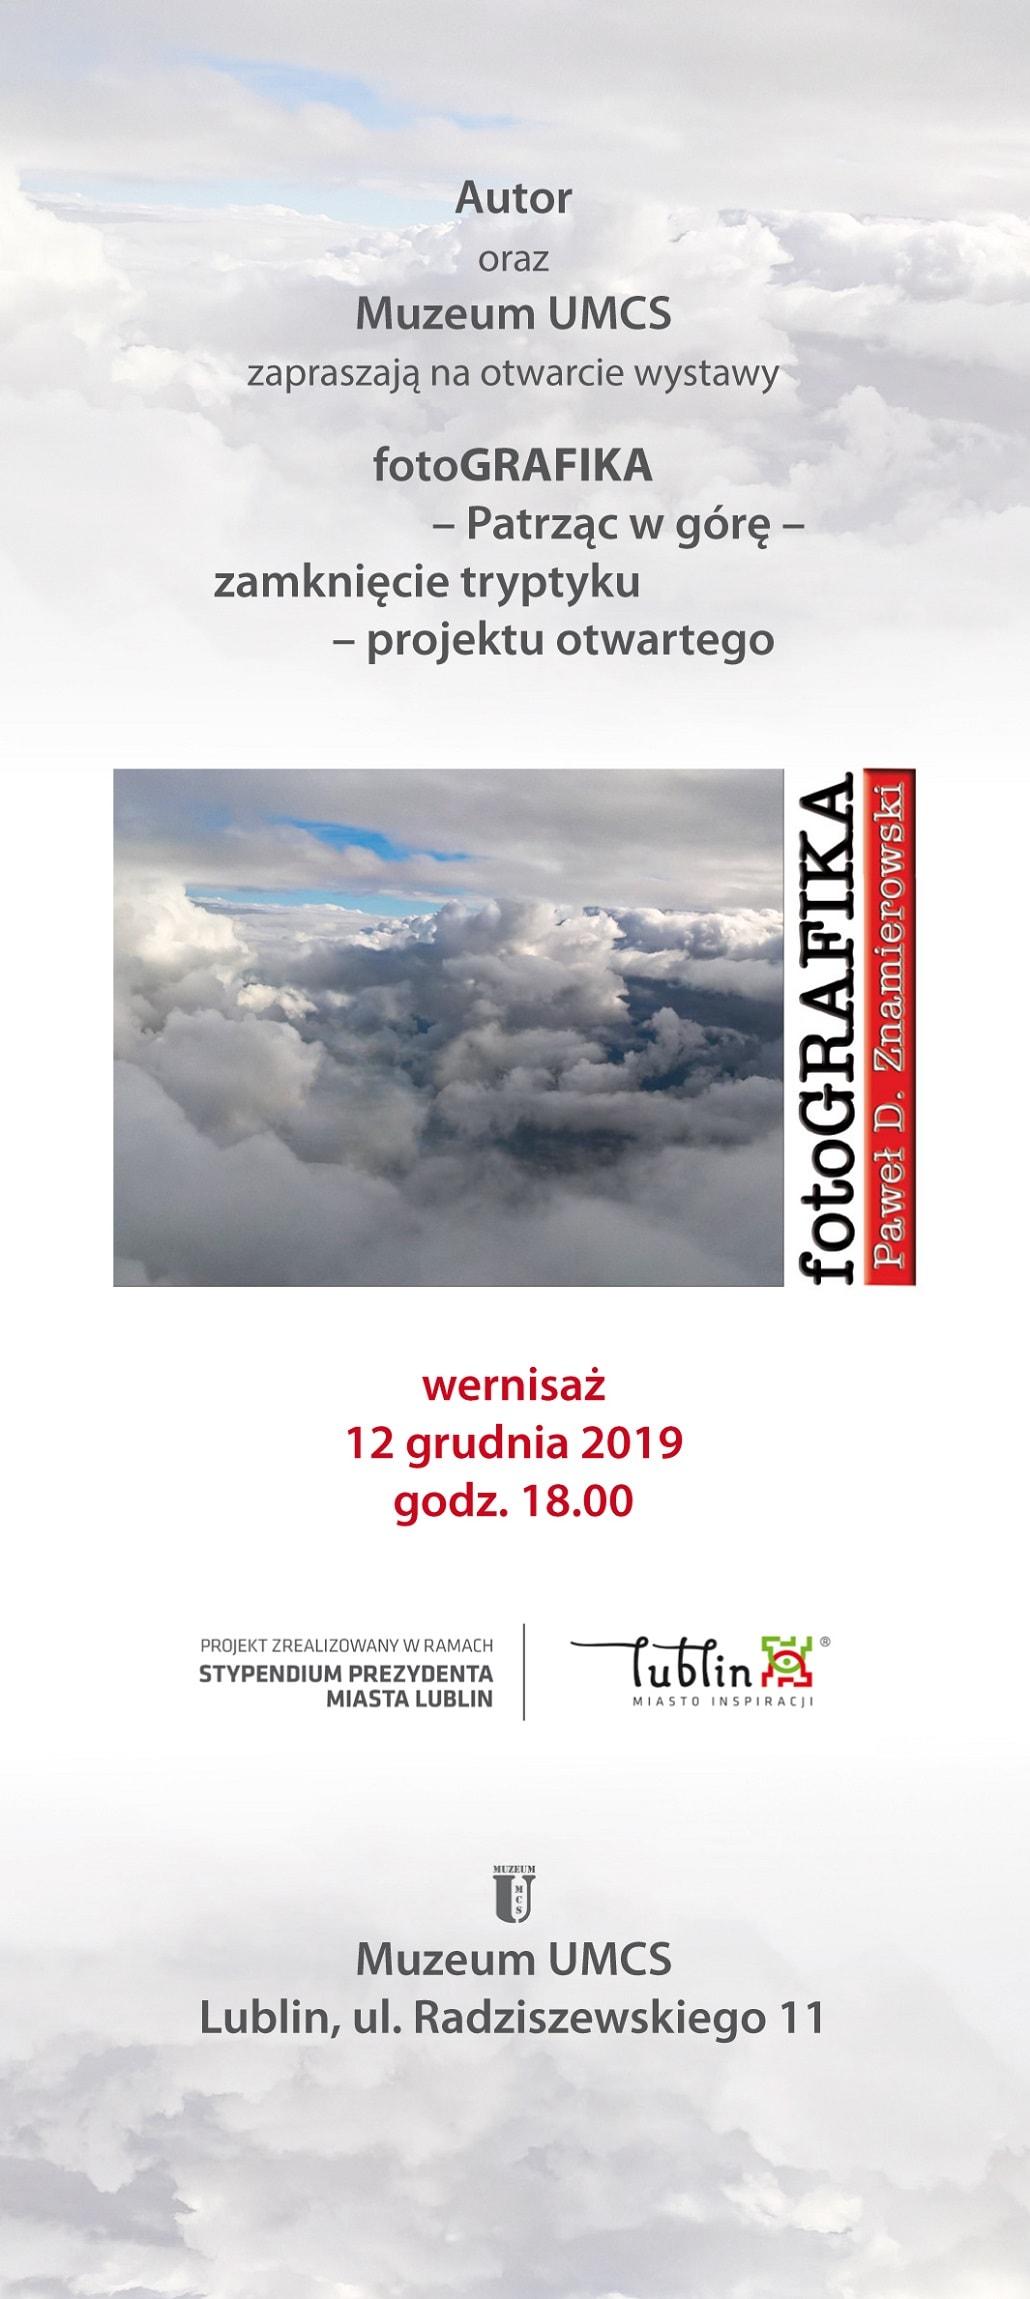 Wernisaż FotoGRAFIKA 2019 UMCS plakat